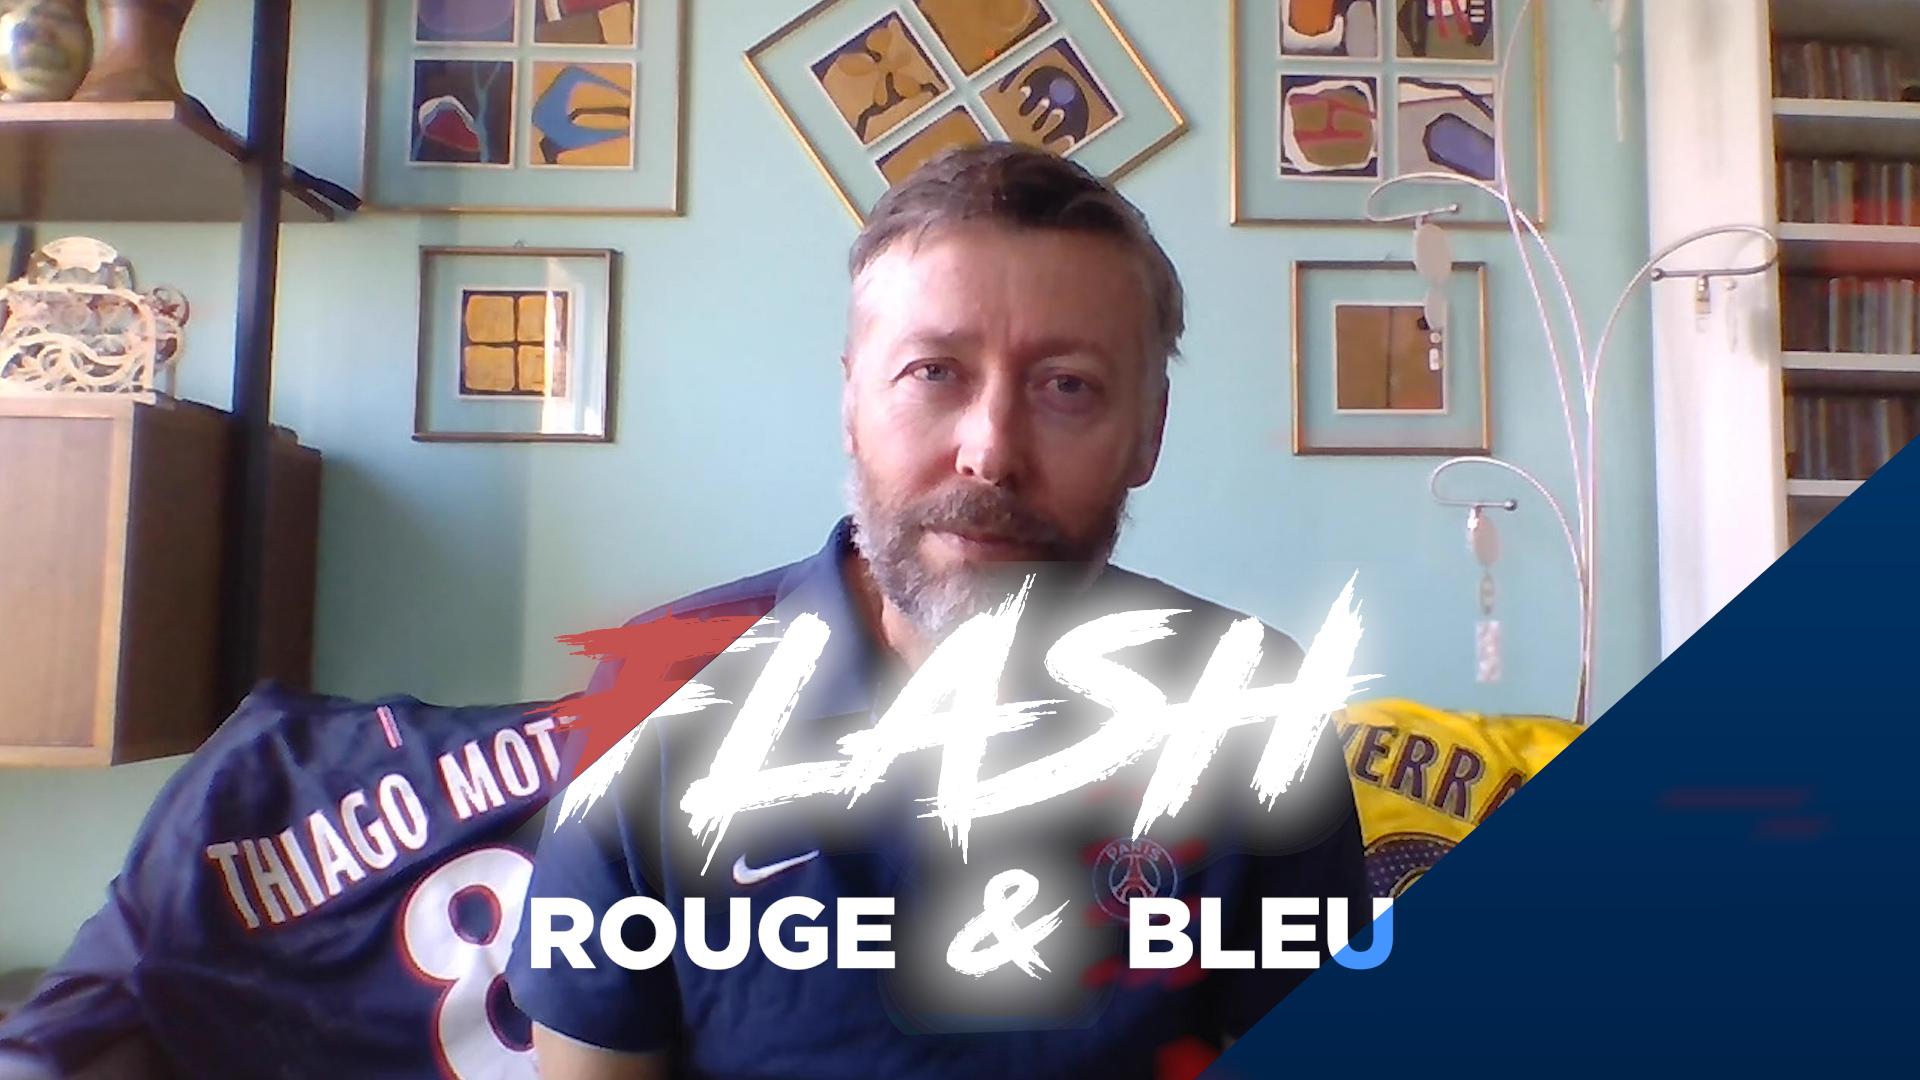 Rouge & Bleu News Flash - Special club jersey, titis, Erding